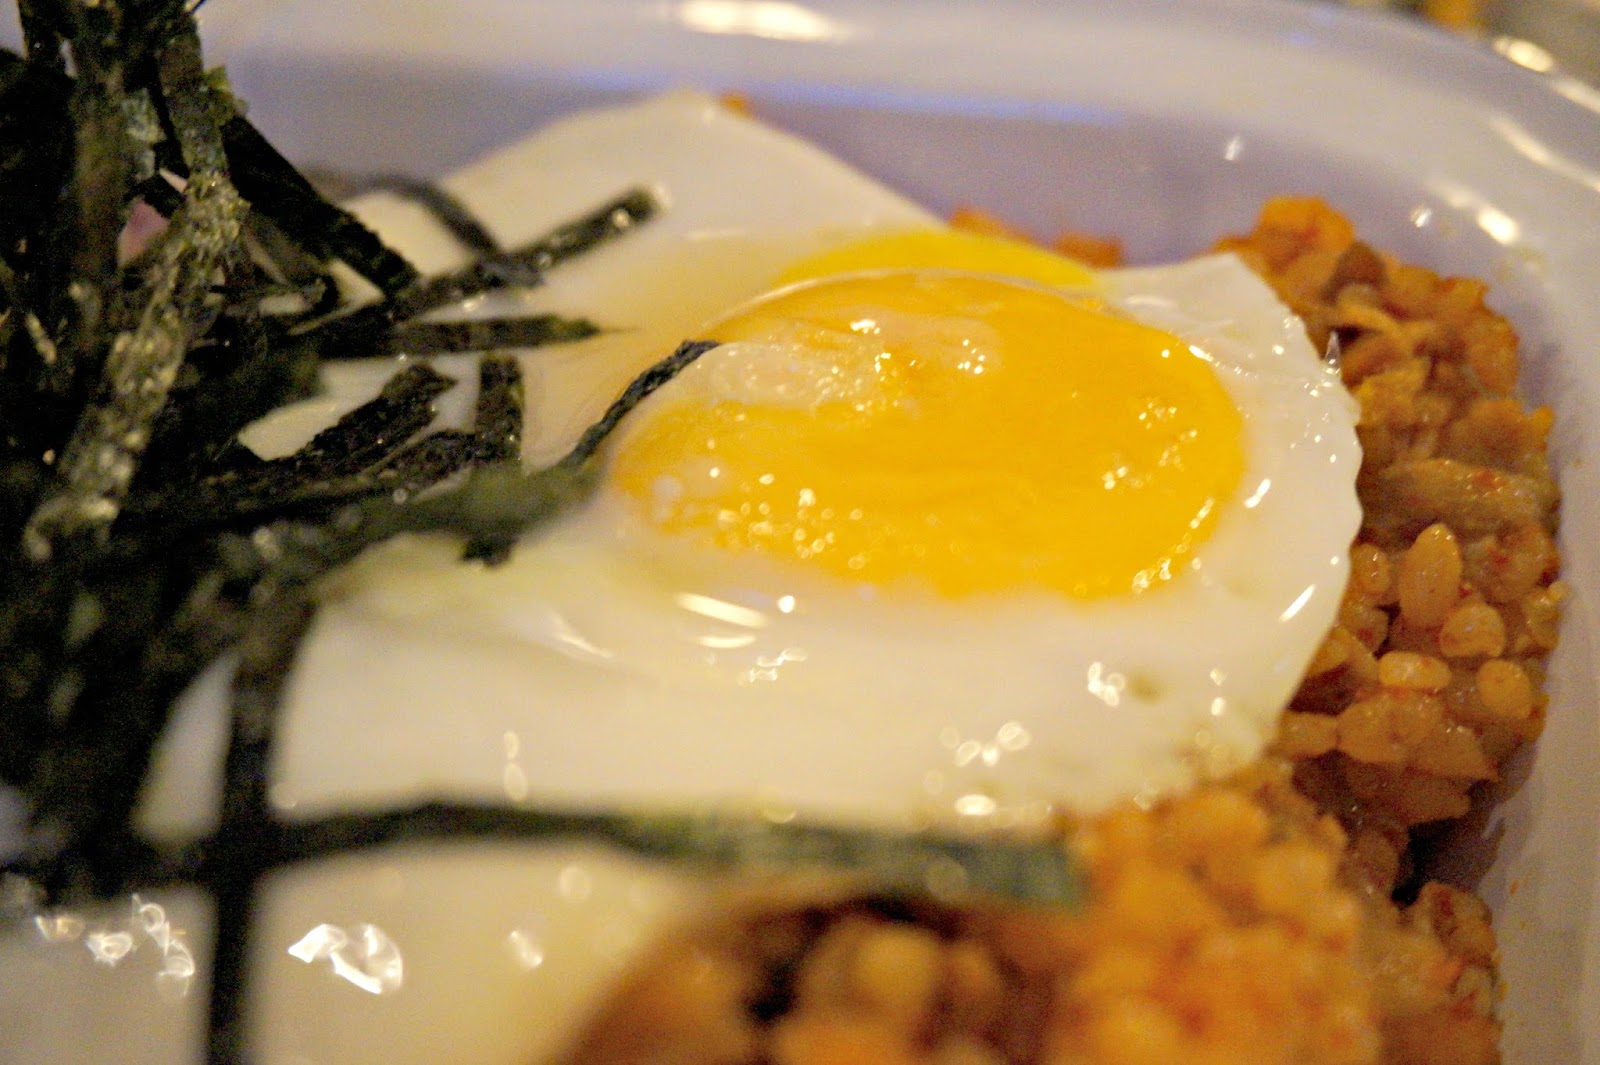 close up of egg yolk